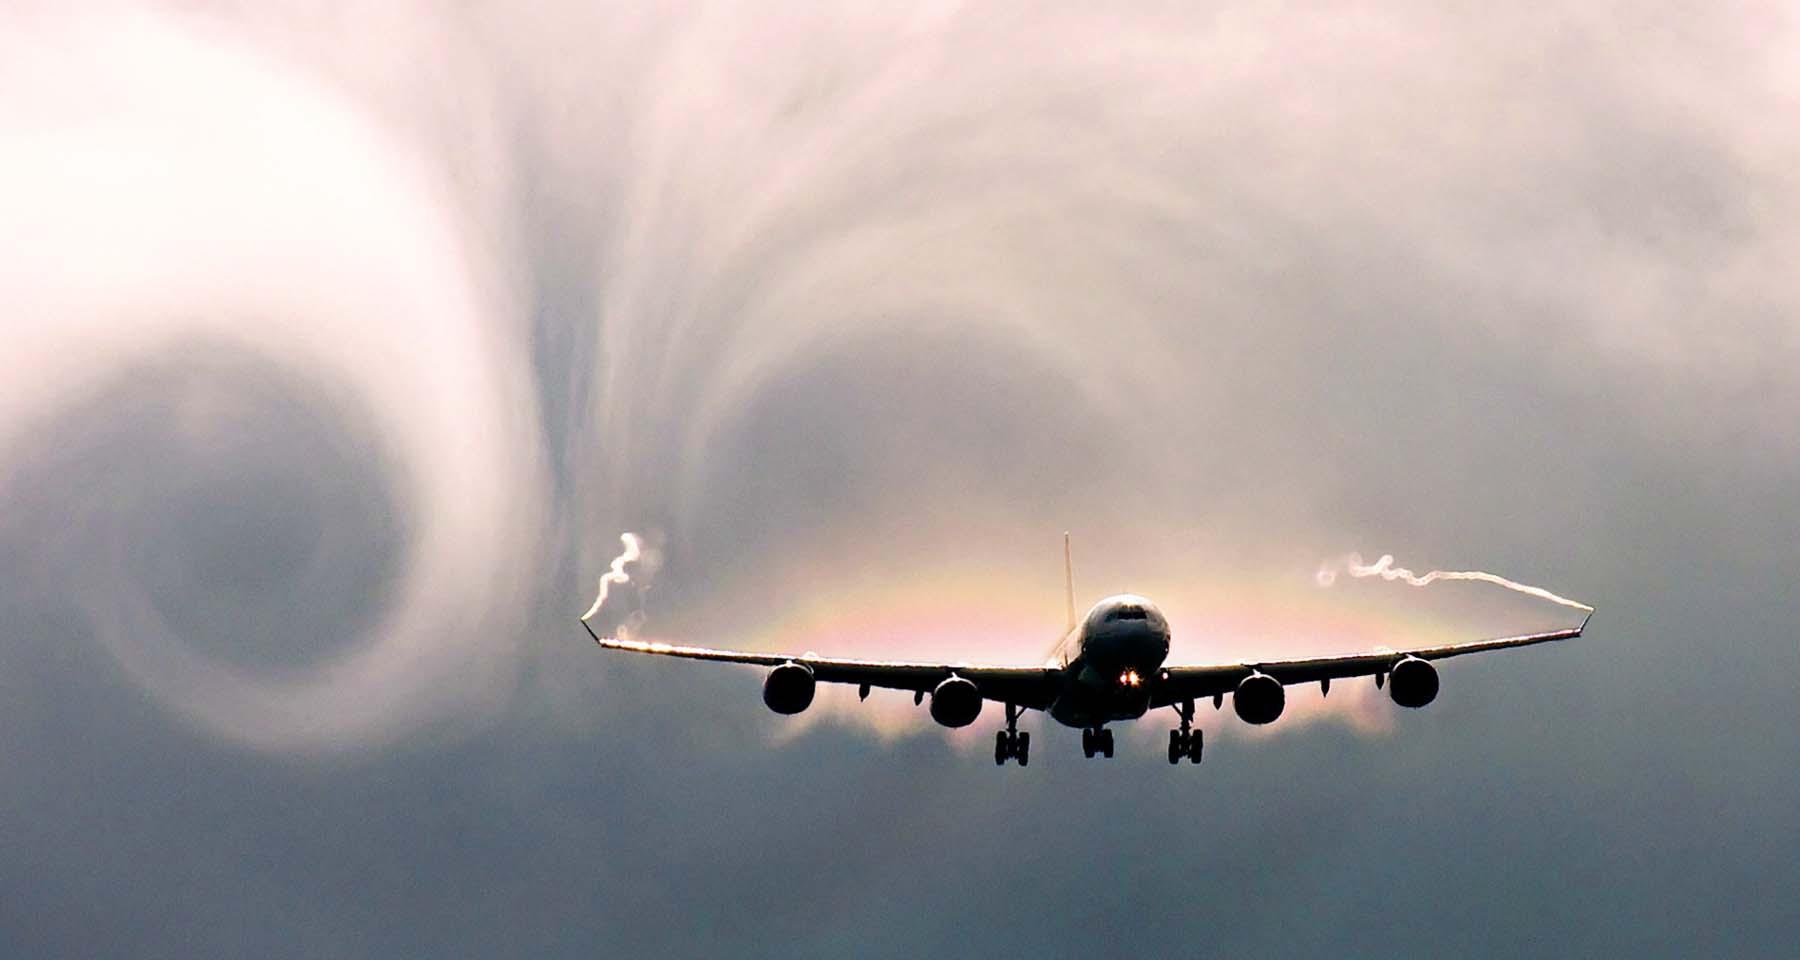 Yolcu uçağı türbulansa girdi! 30 kişi yaralandı